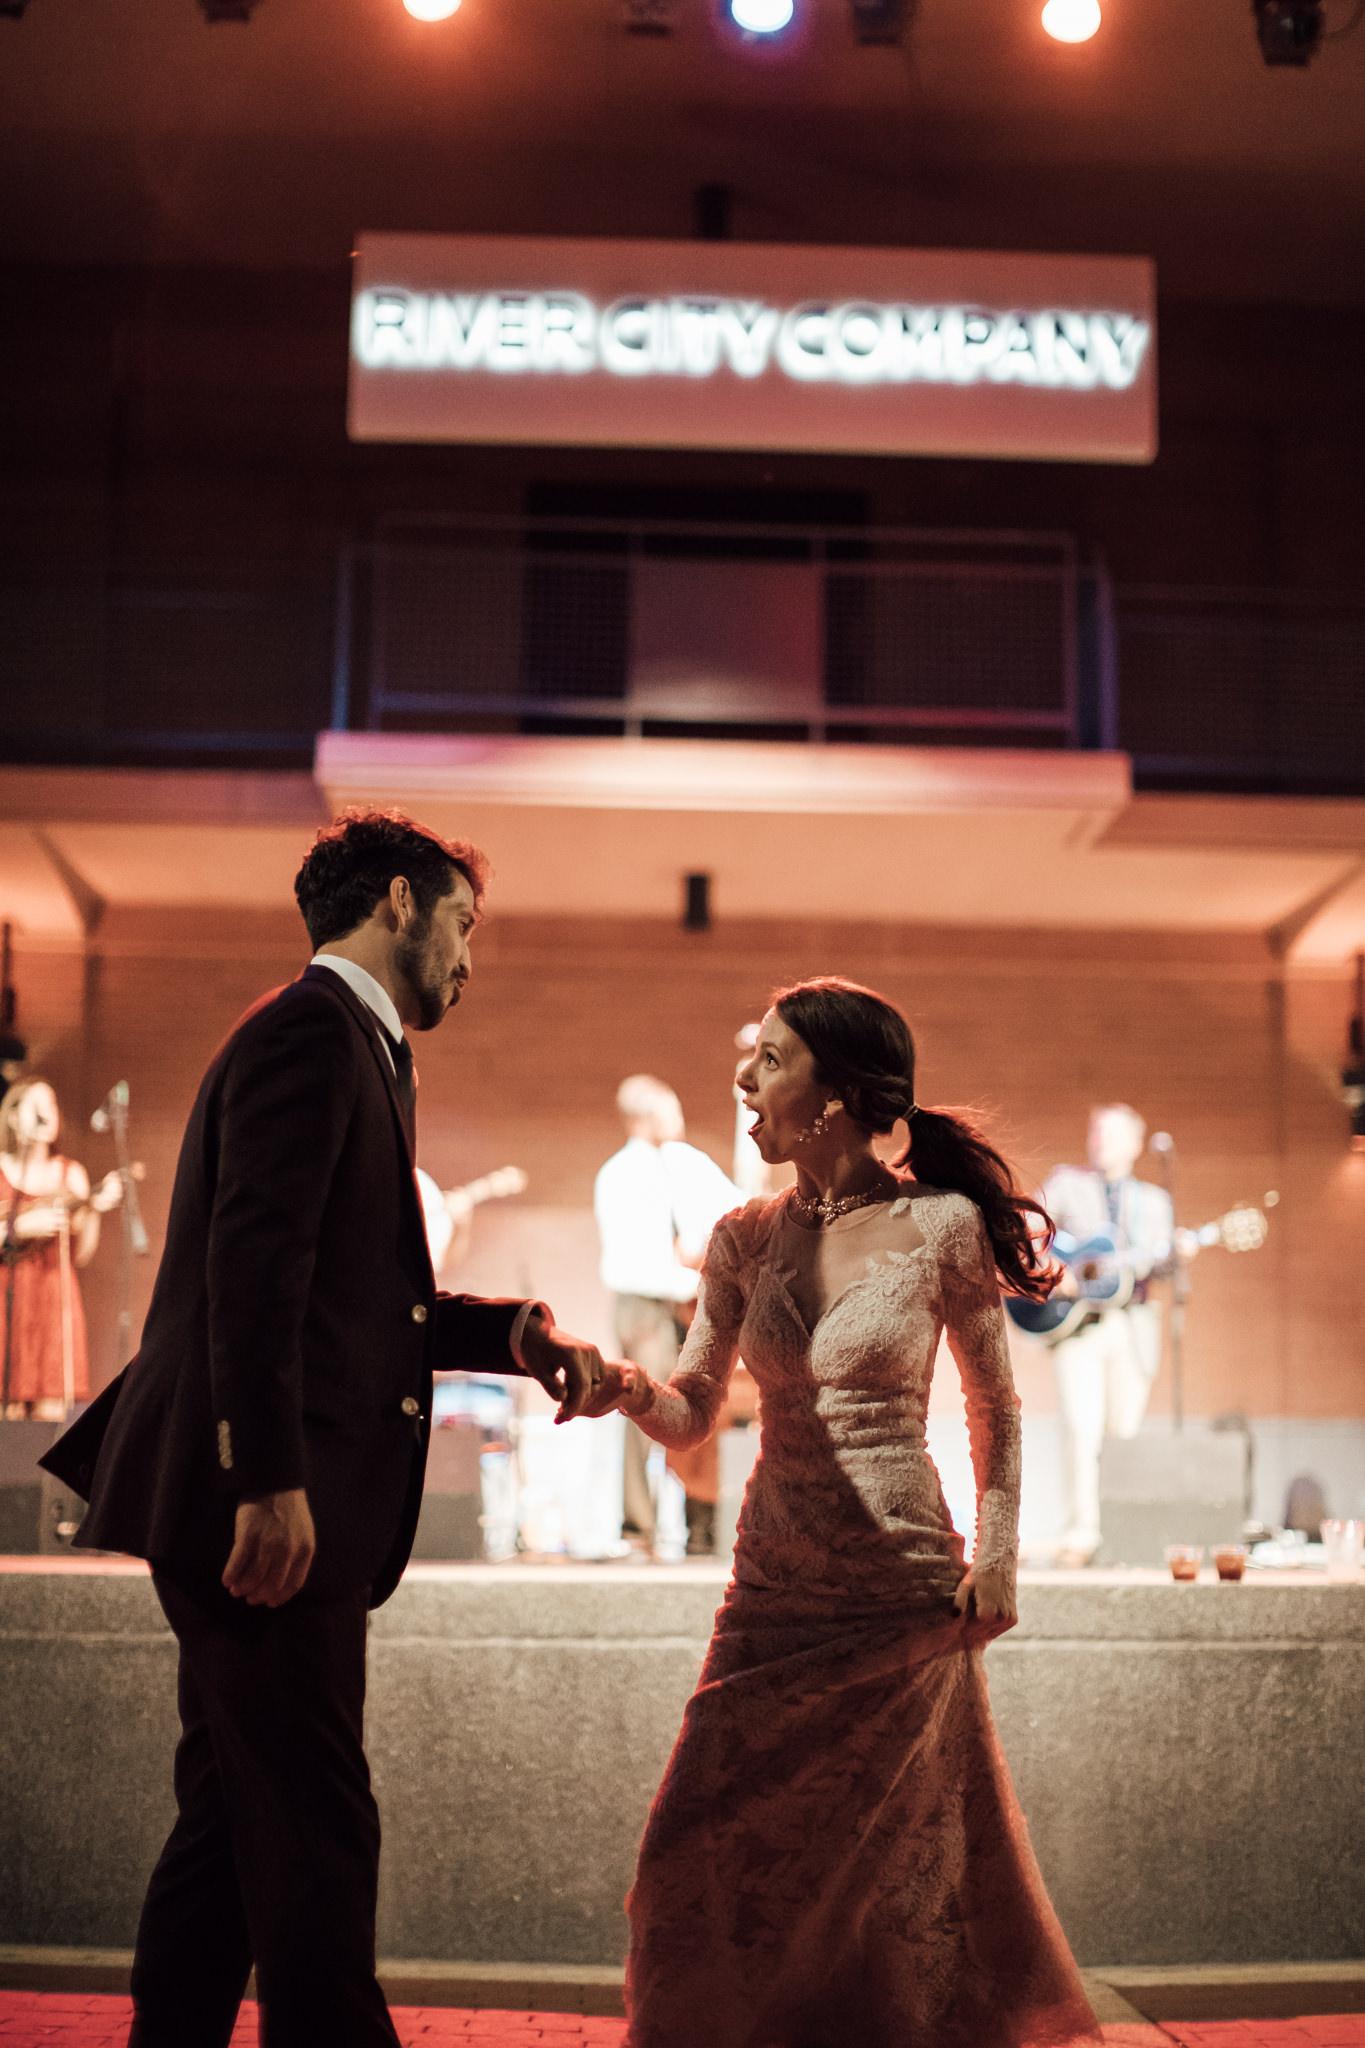 cassie-cook-photography-chattanooga-wedding-photographer-waterhouse-pavillion-cassie-matt-wedding-118.jpg